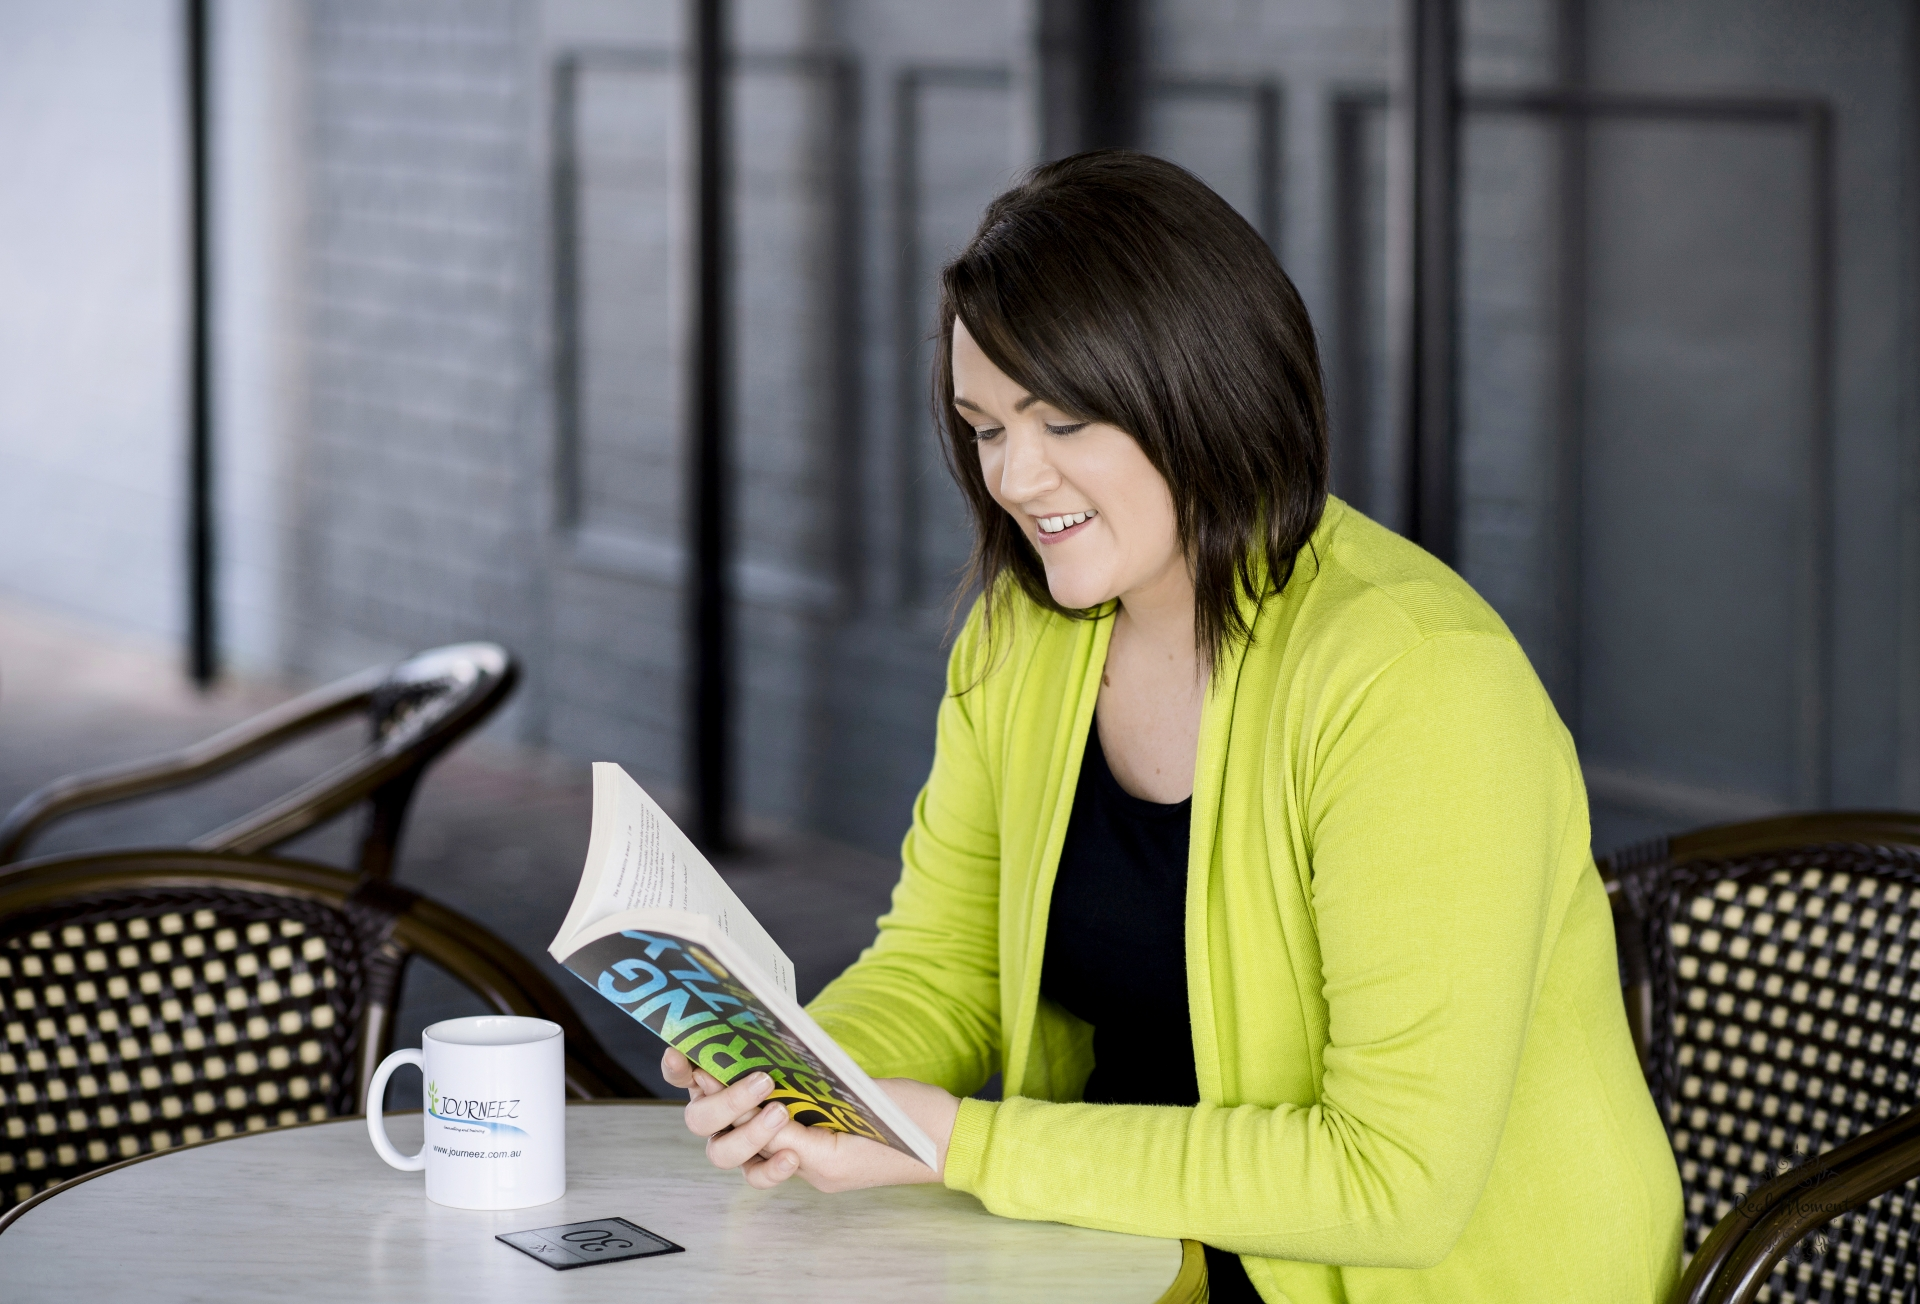 Women in business - Magazine ready - Anna Doecke